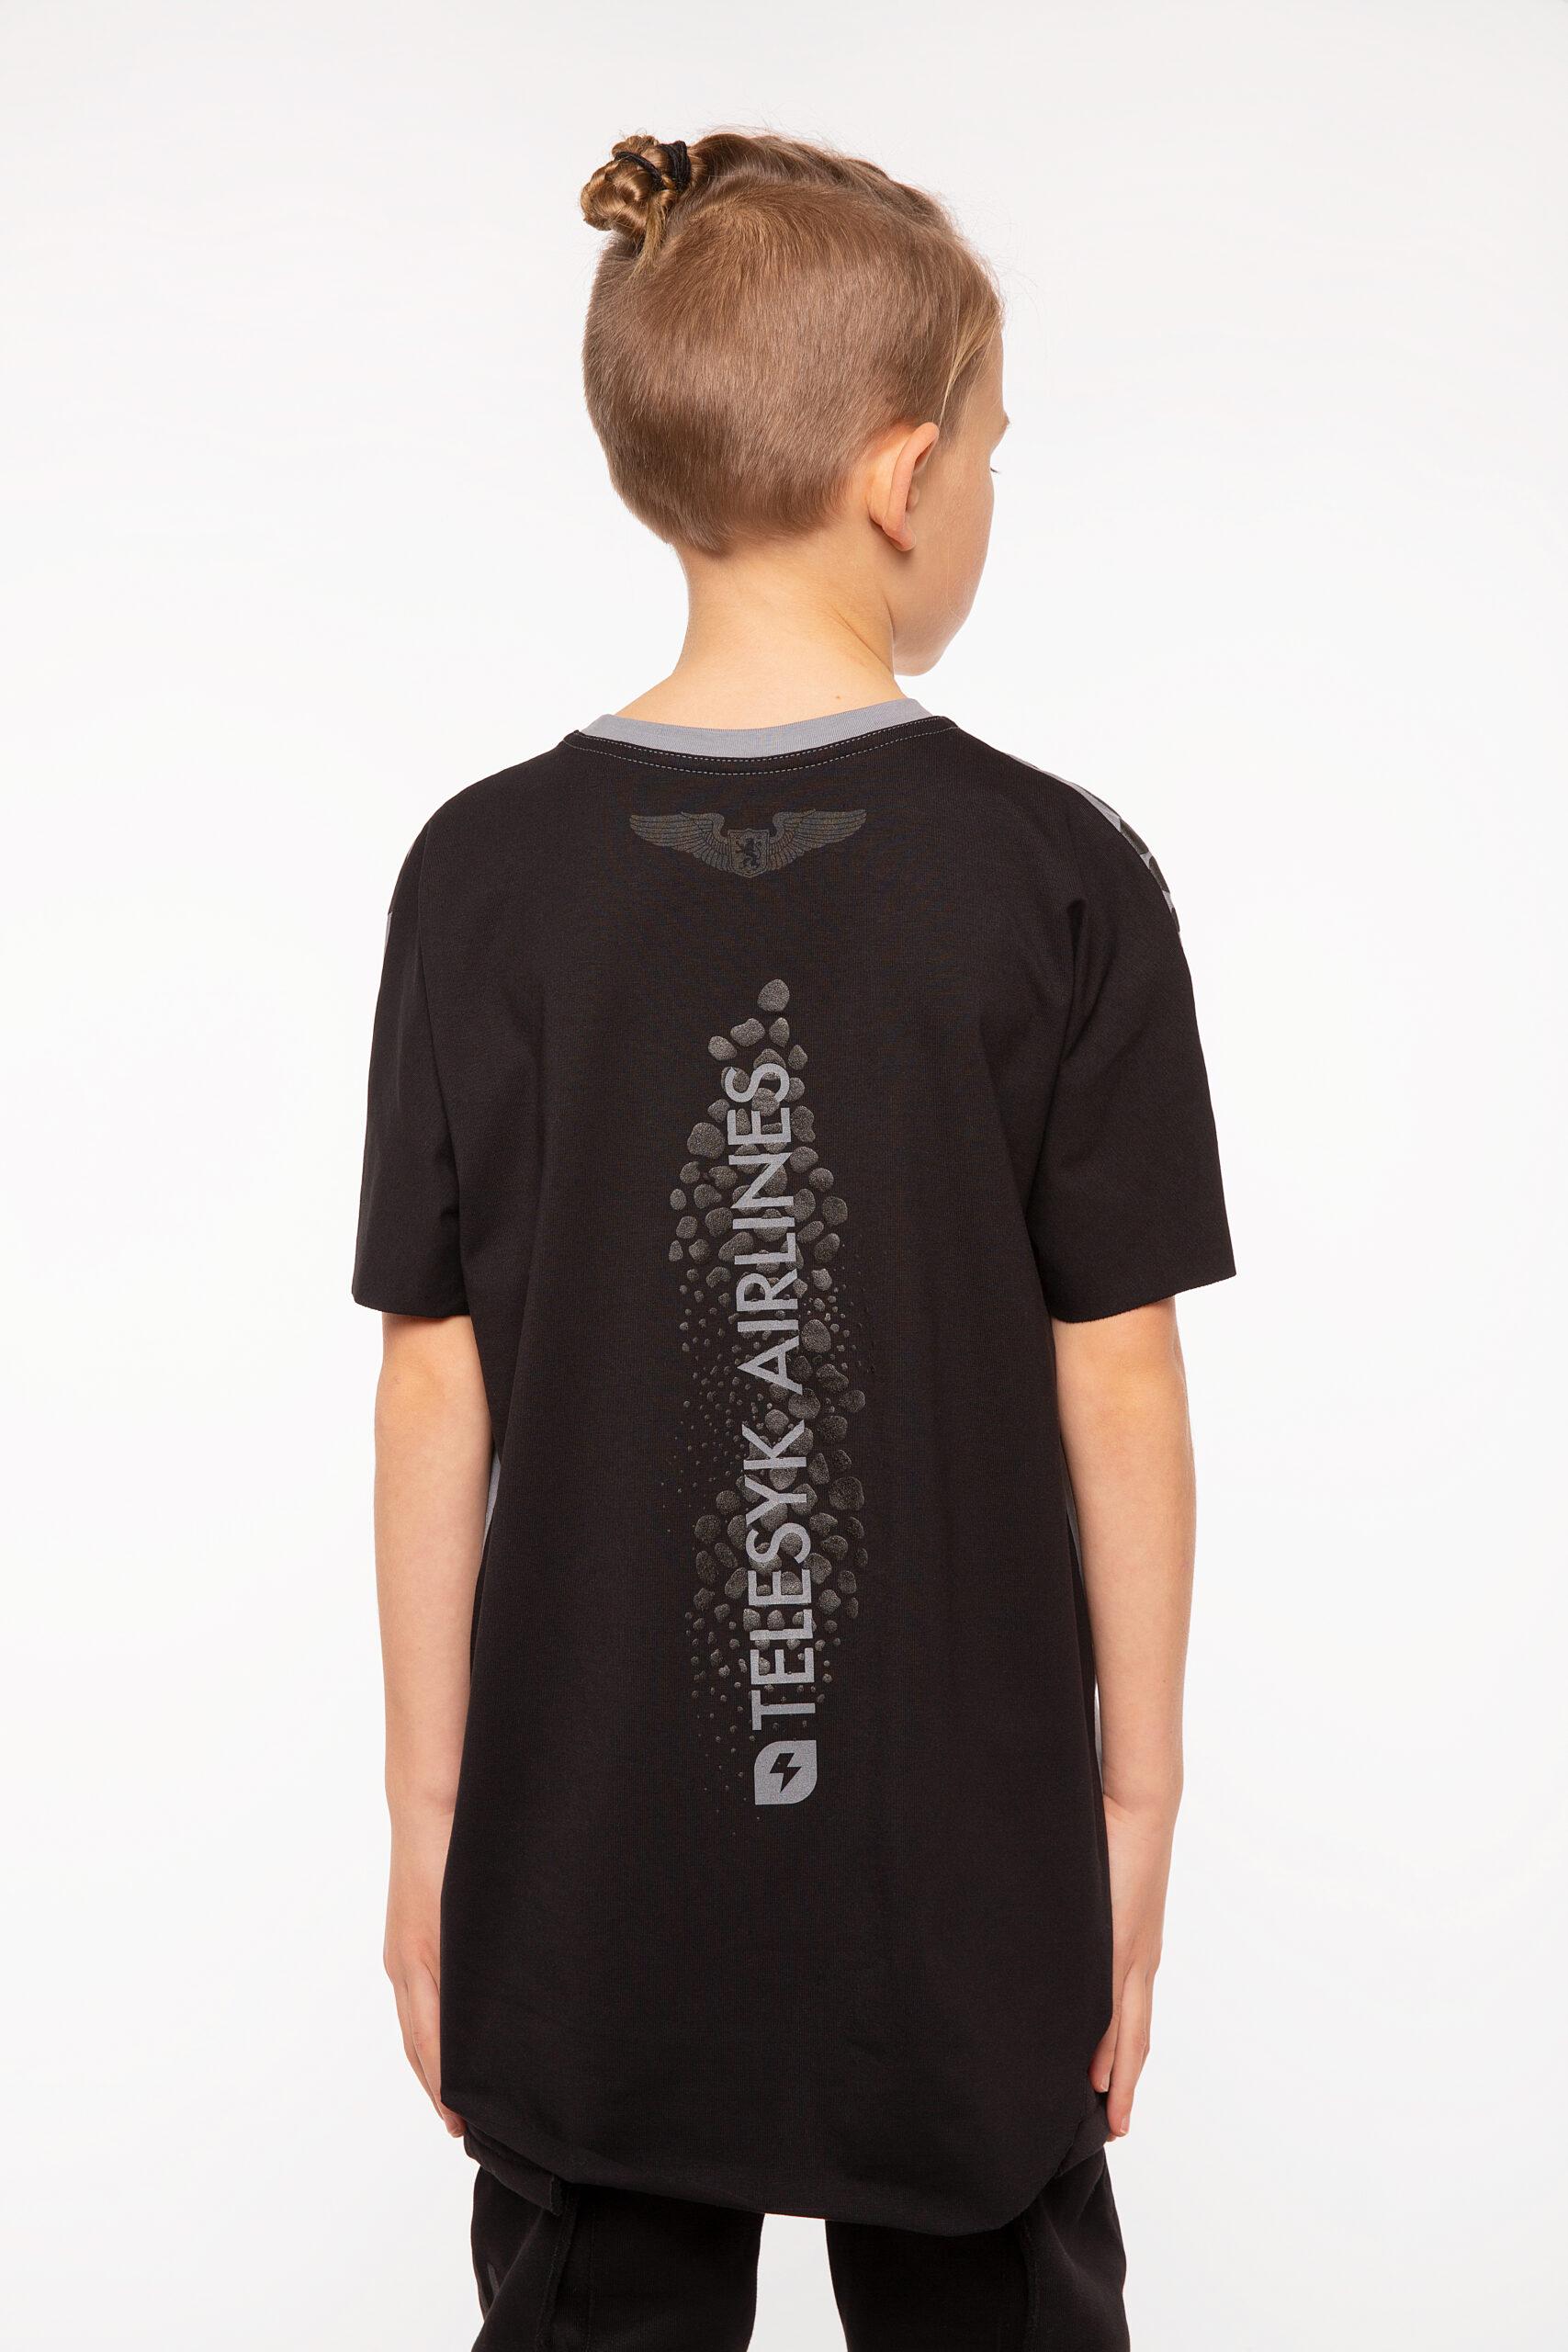 Kids T-Shirt Stingray. Color dark gray.  Technique of prints applied: silkscreen printing.